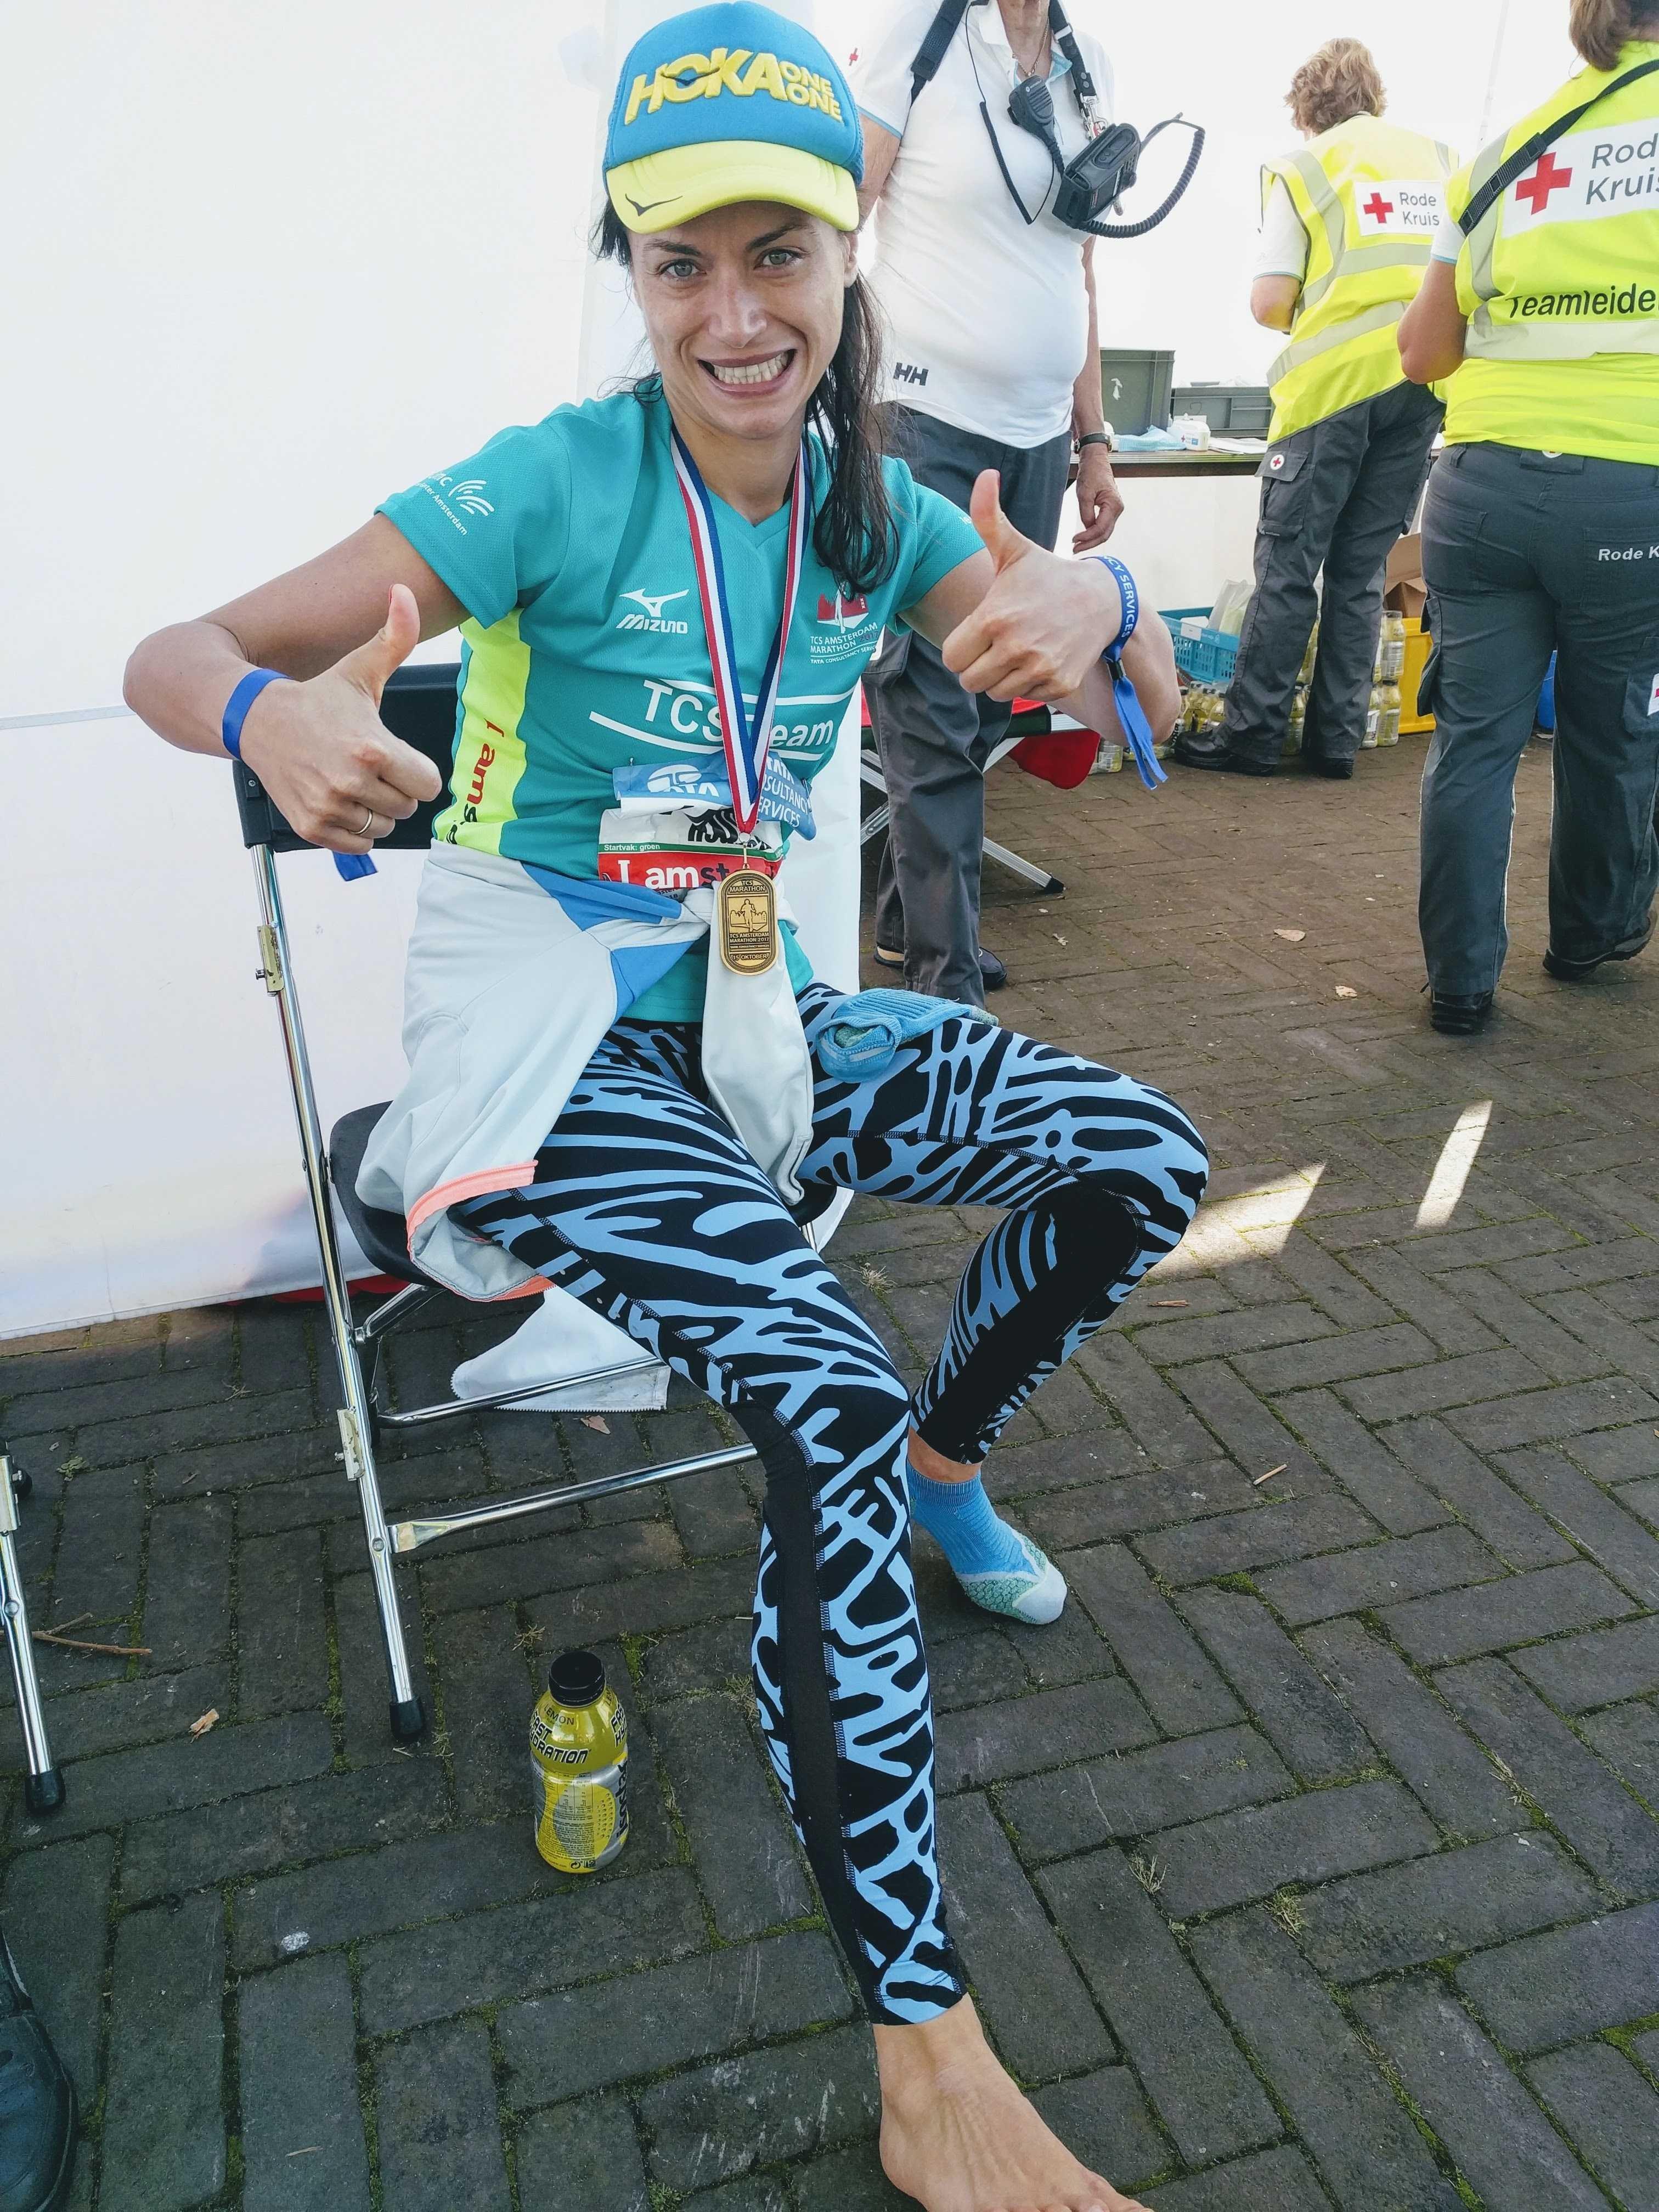 Rodica Marathon